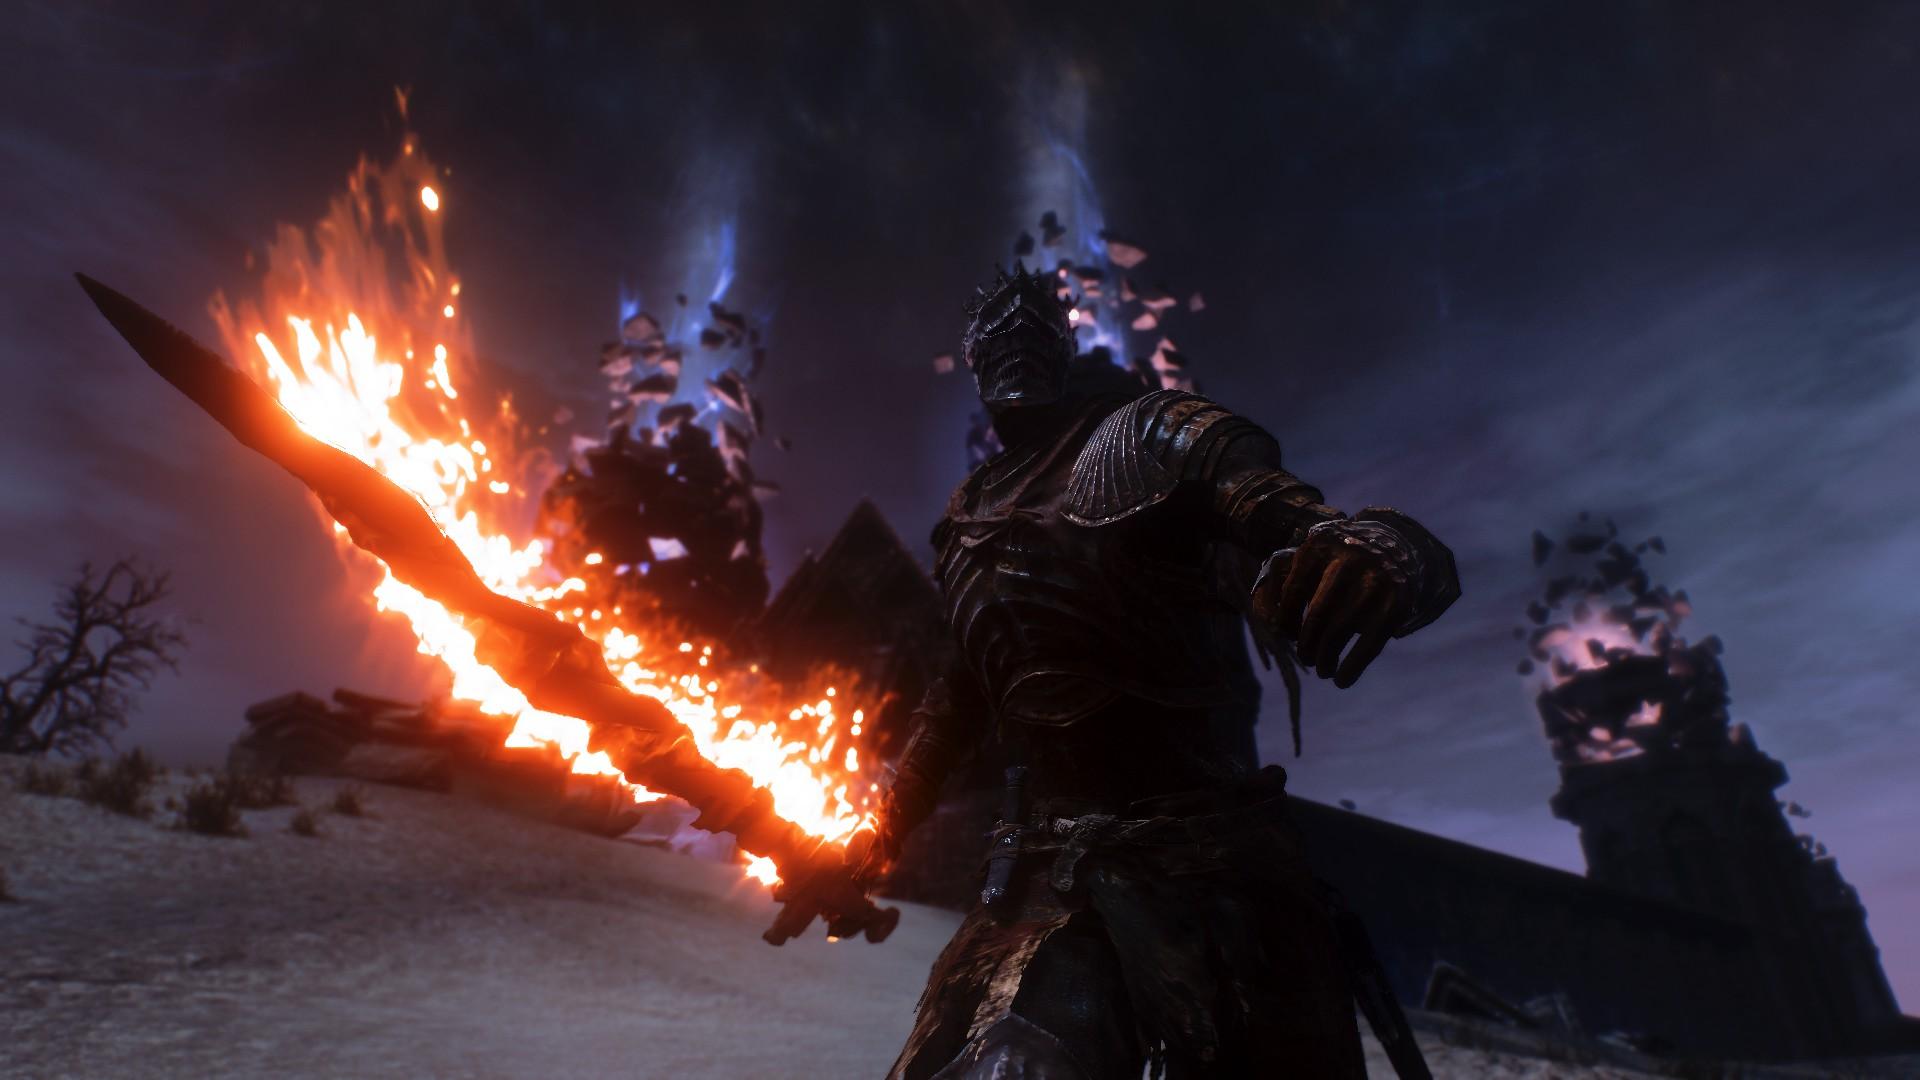 Steam Workshop Dark Souls Iii Soul Of Cinder Armor And